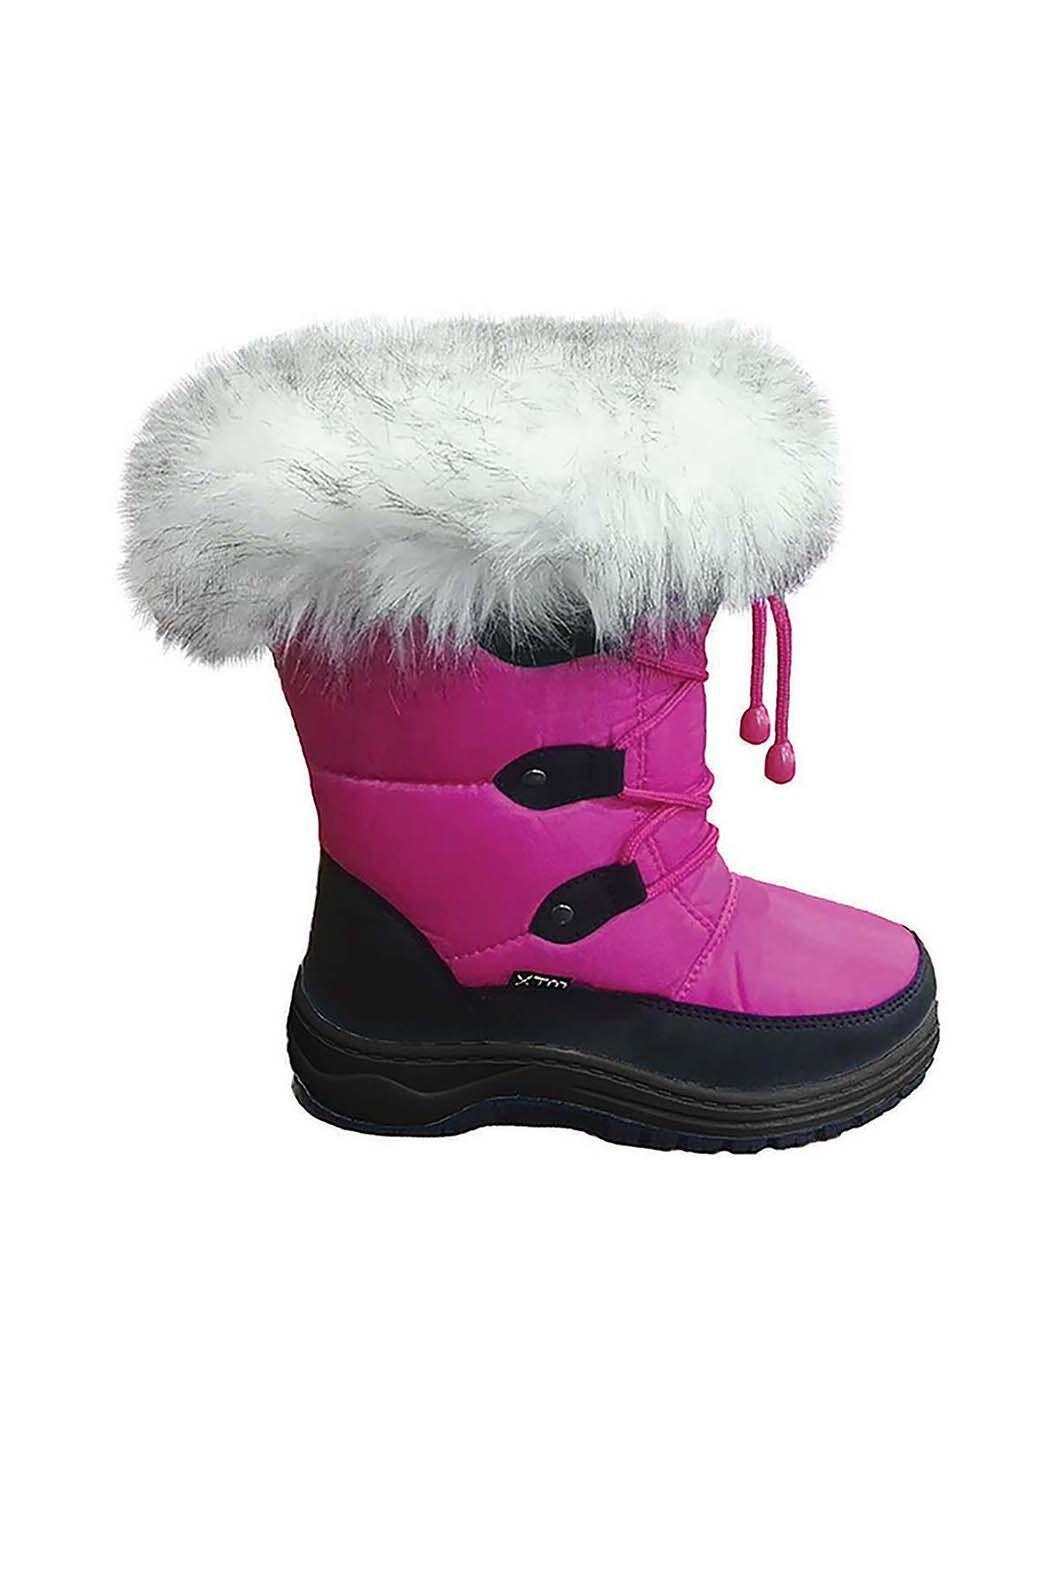 XTM Kids' Skyler Snow Boots, Hot Pink, hi-res